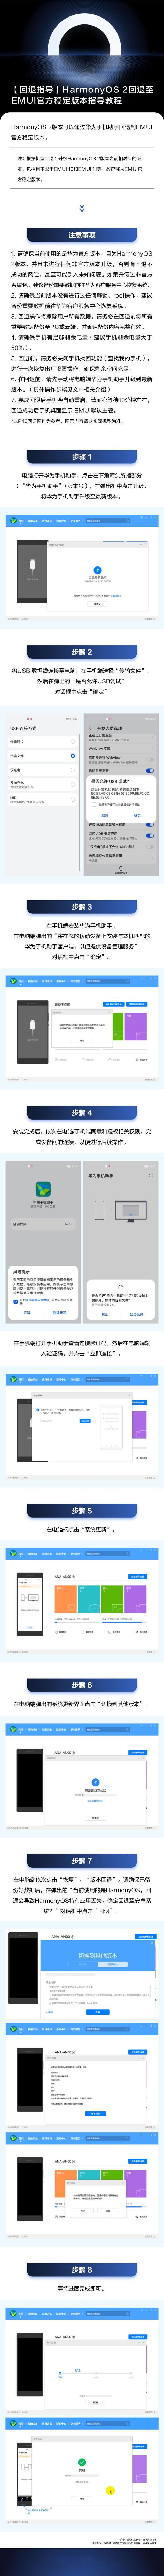 xiu【回退指导】HarmonyOS 2回退至EMUI官方稳定版本指导教程 拷贝.jpg